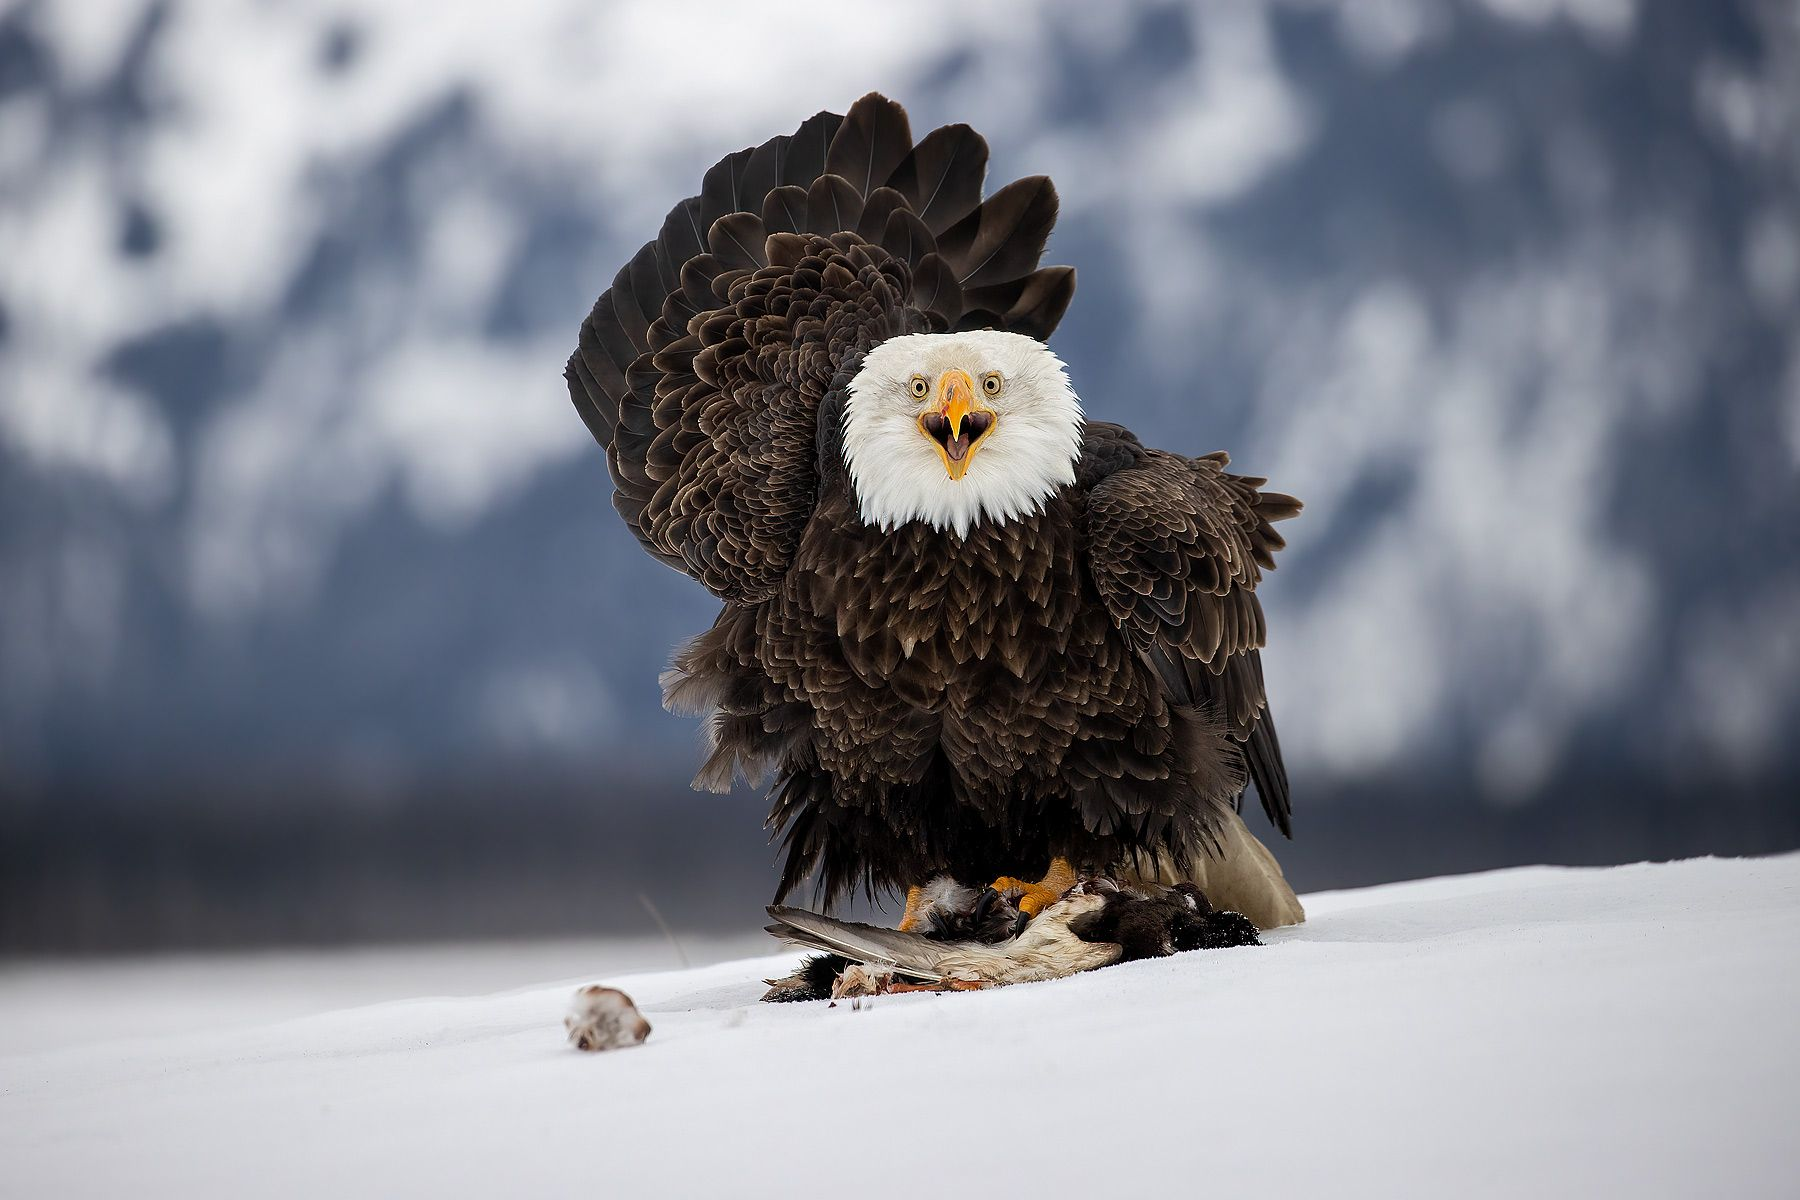 Bald-eagle-with-a-duck-prey_74I1424-Kachemak-Bay,-Alaska,-USA.jpg